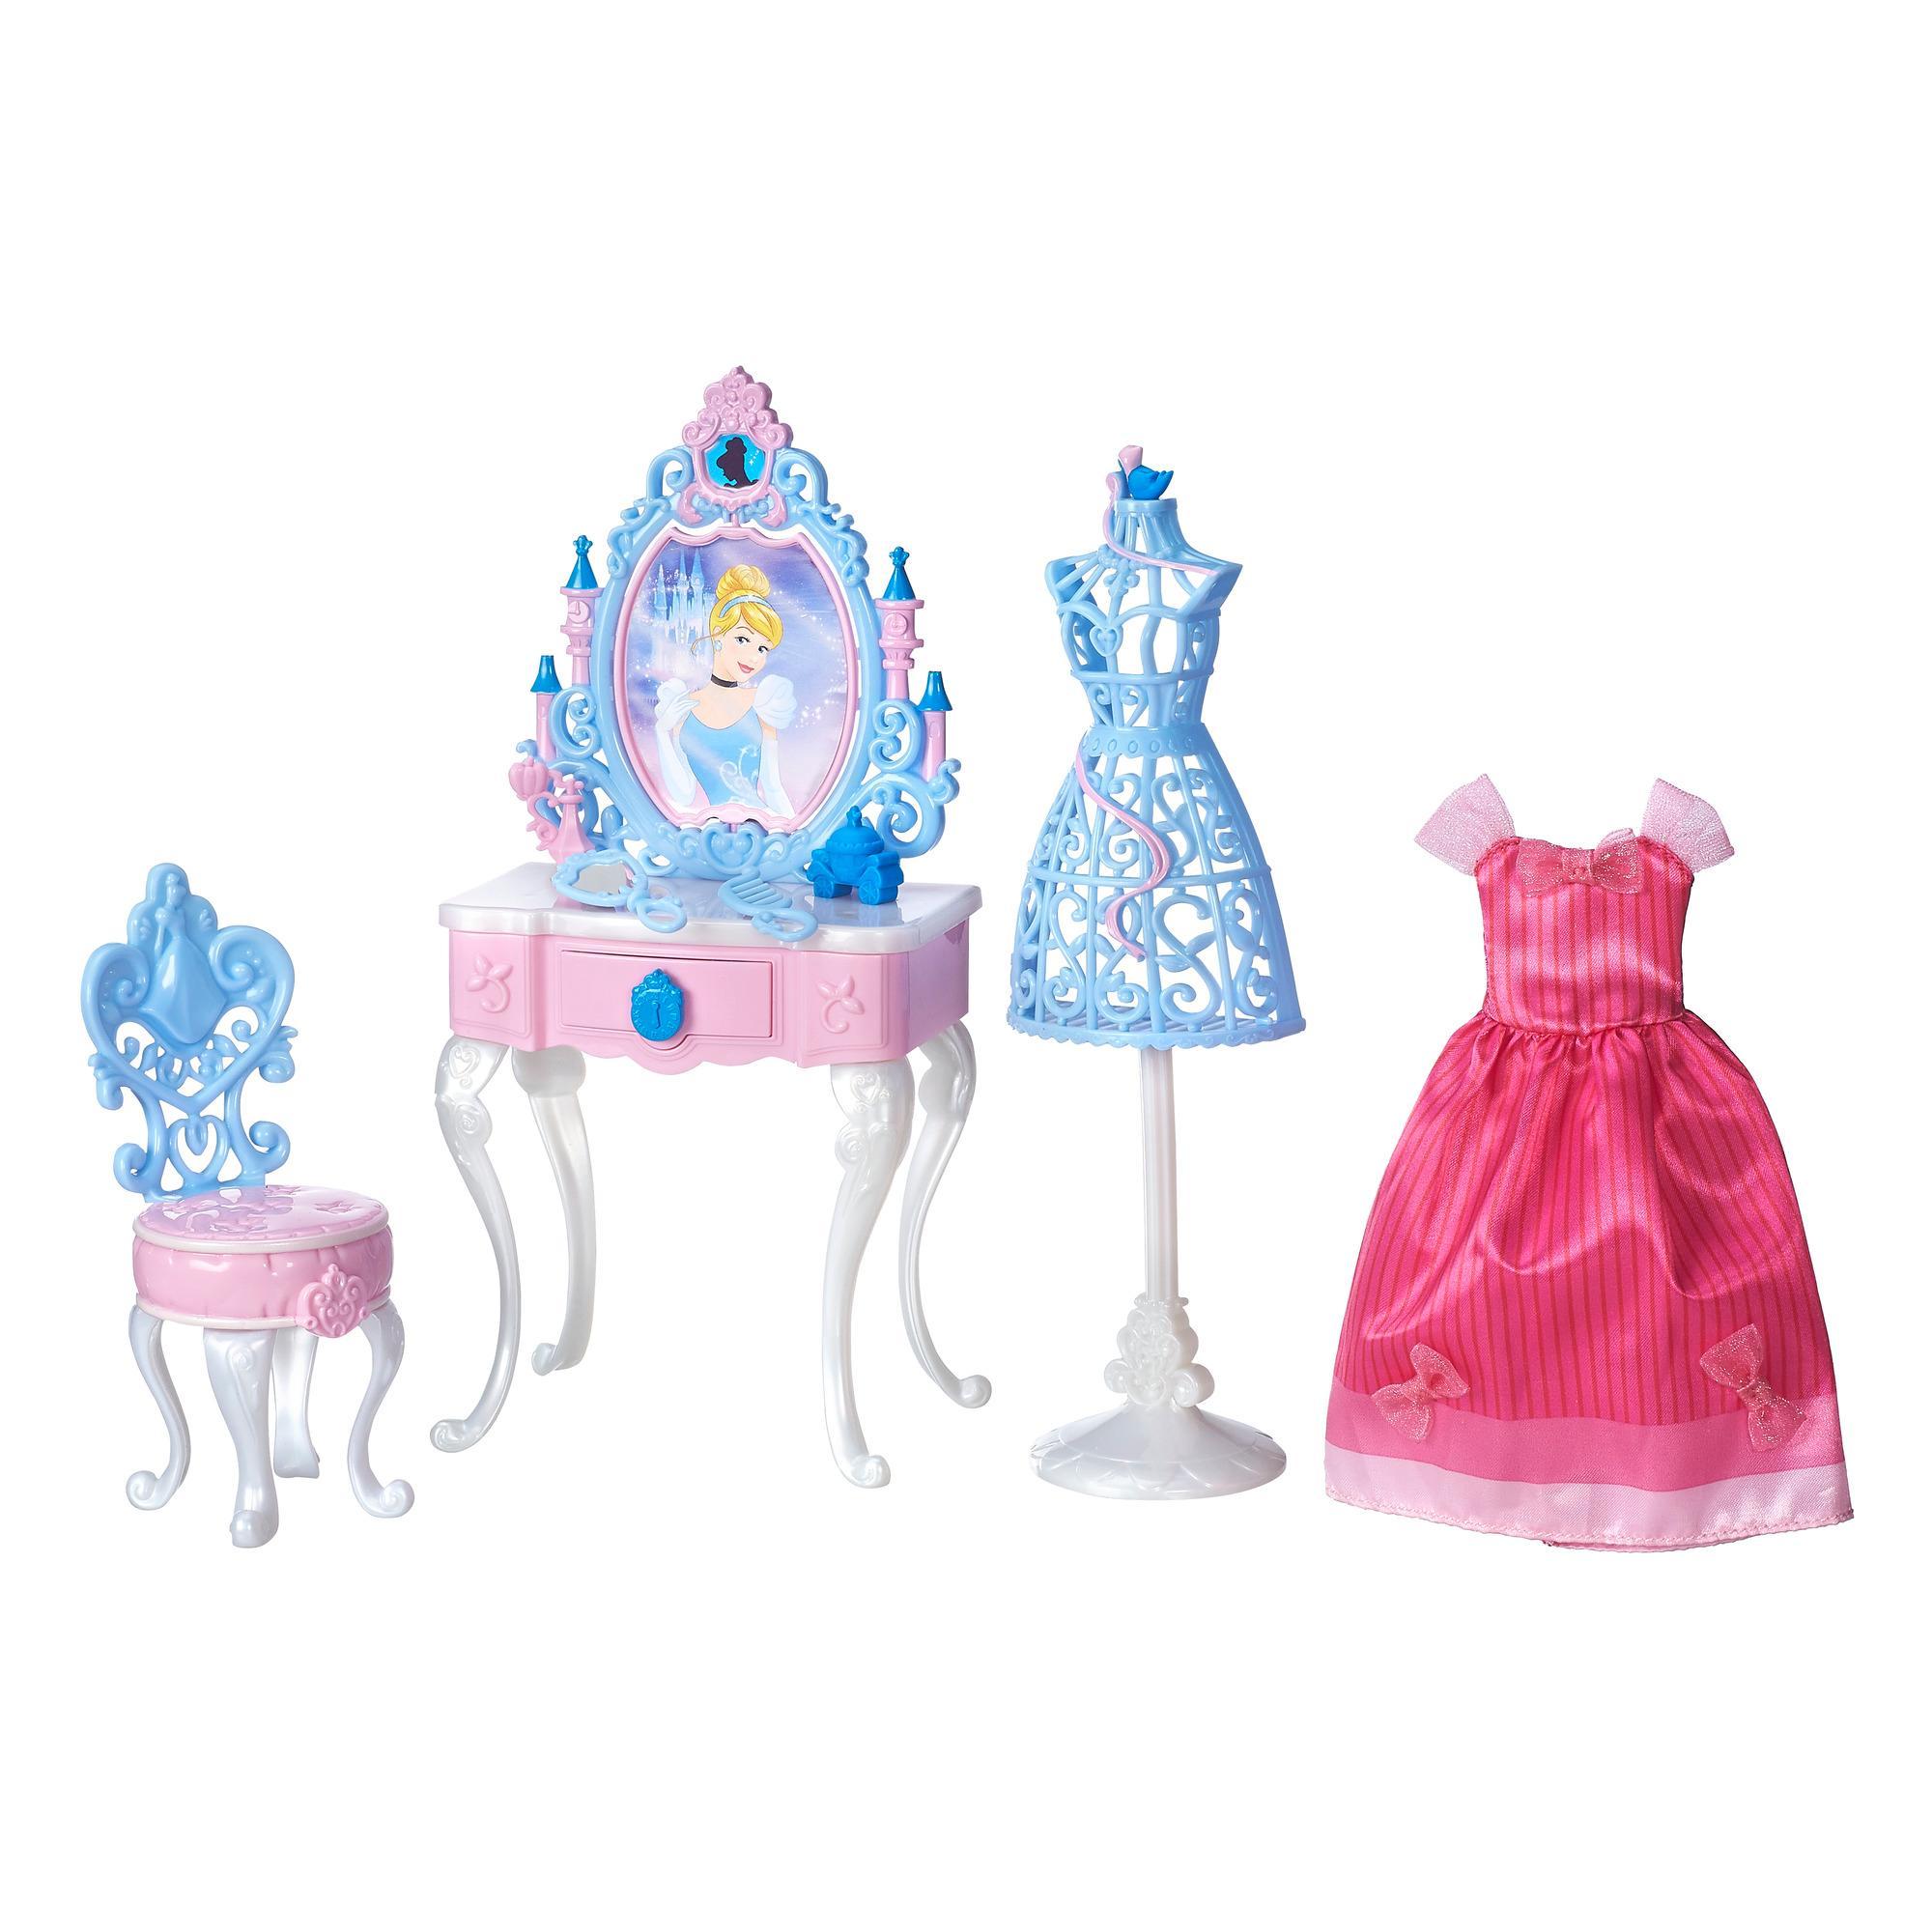 Sentinel Cinderella Enchanted Bedroom Vanity Scene Play Set Disney Princess  Girls Age 3+